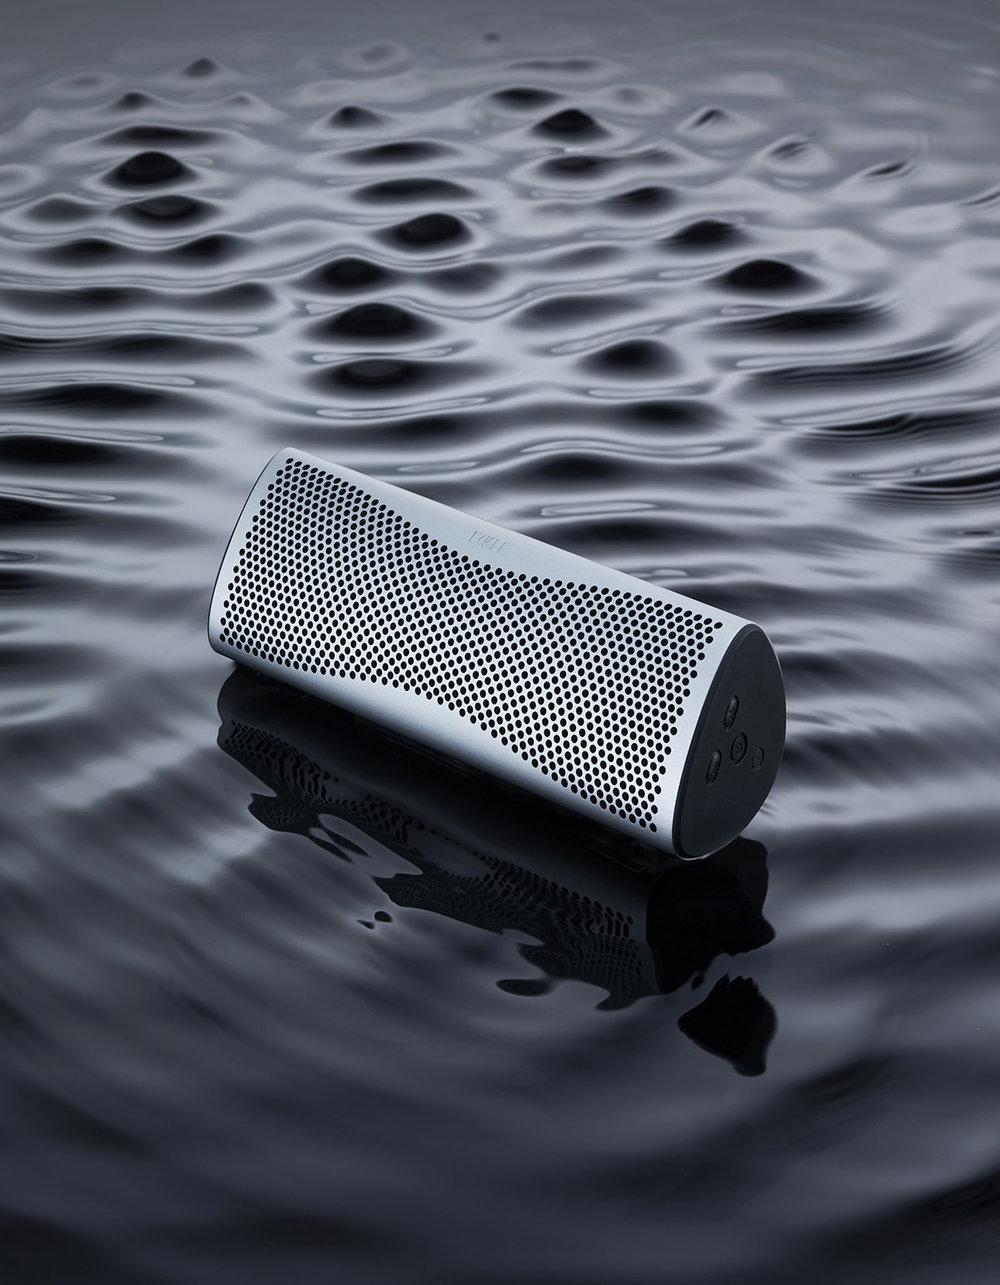 kef-muo-speaker-ross-lovegrove-computational-design-andrea-locatelli-05.jpg